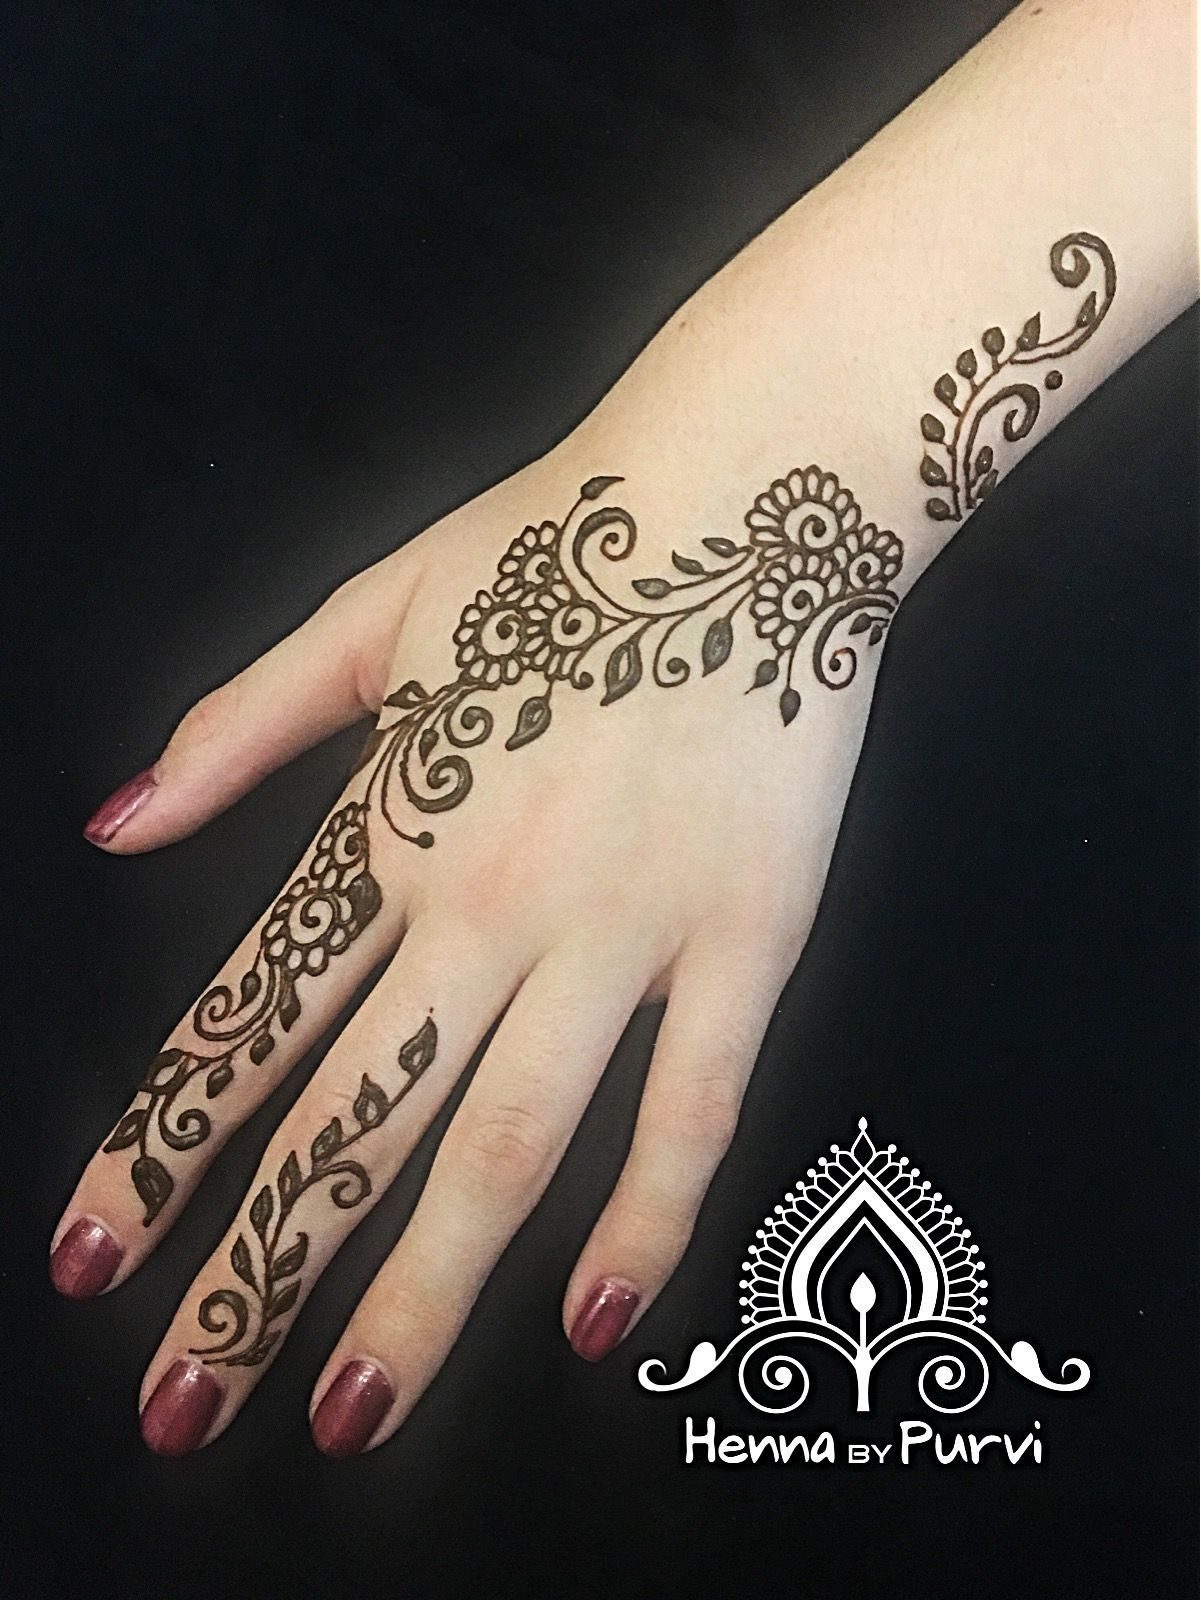 Pin By Shayda Khan On Henna Design Pinterest Henna Mehndi And